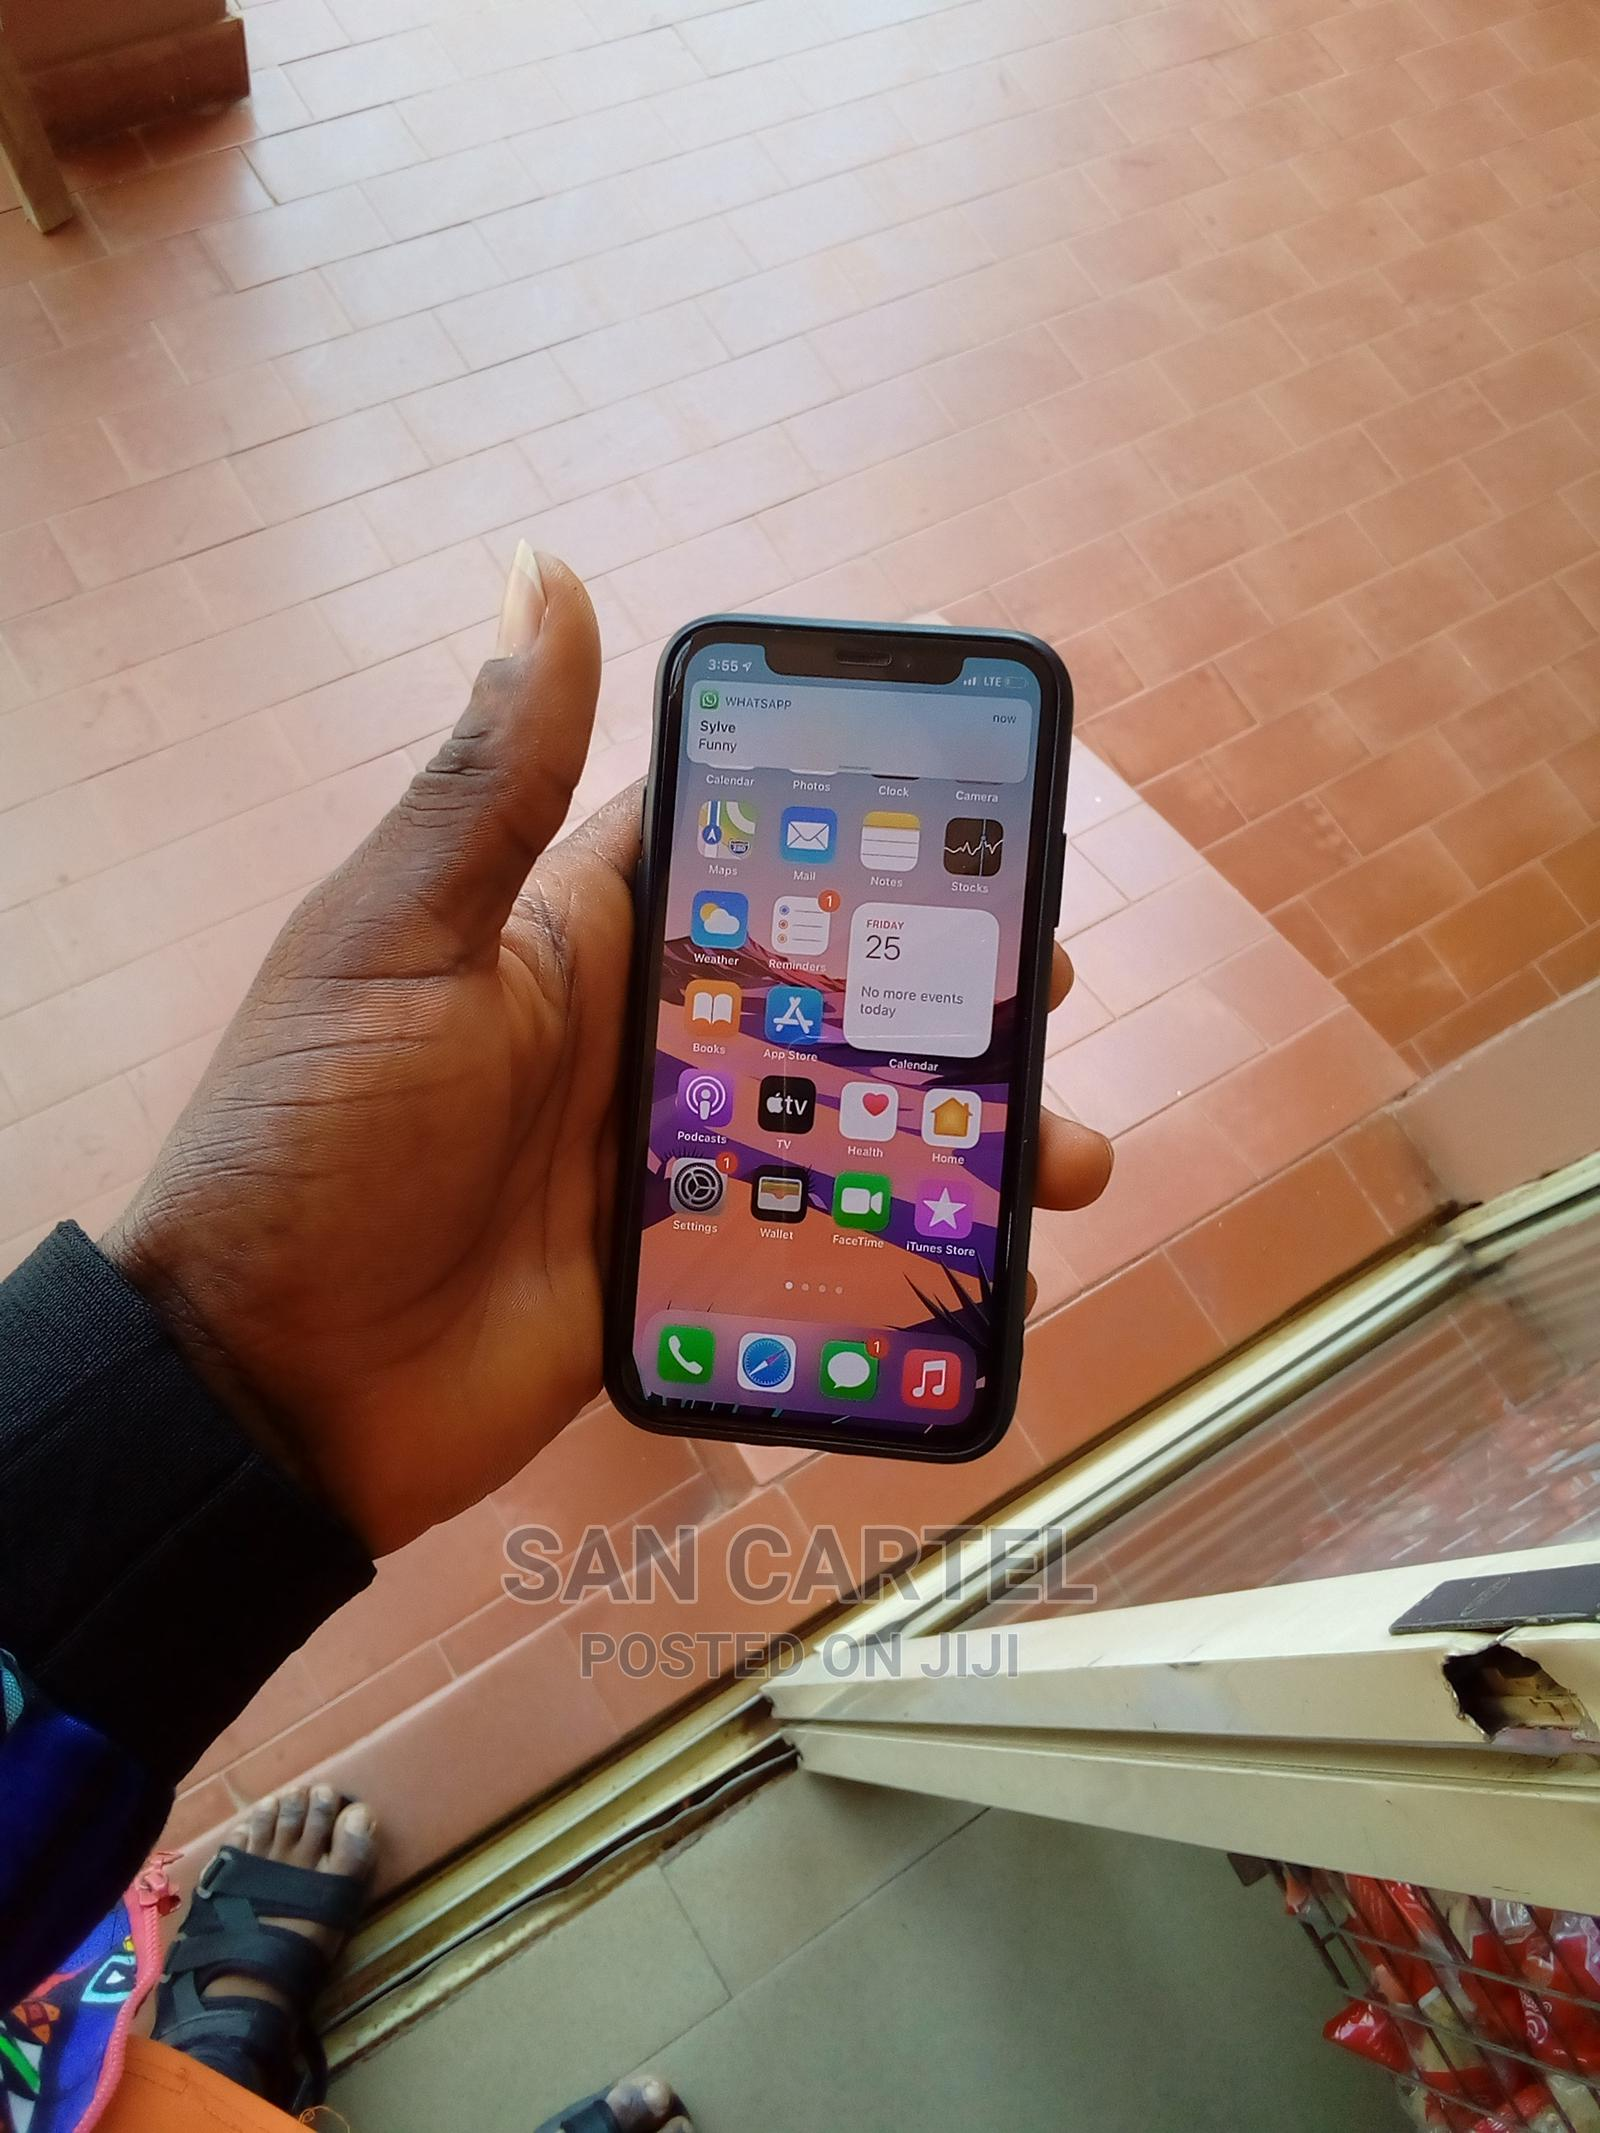 Apple iPhone X 64 GB White | Mobile Phones for sale in Abakaliki, Ebonyi State, Nigeria